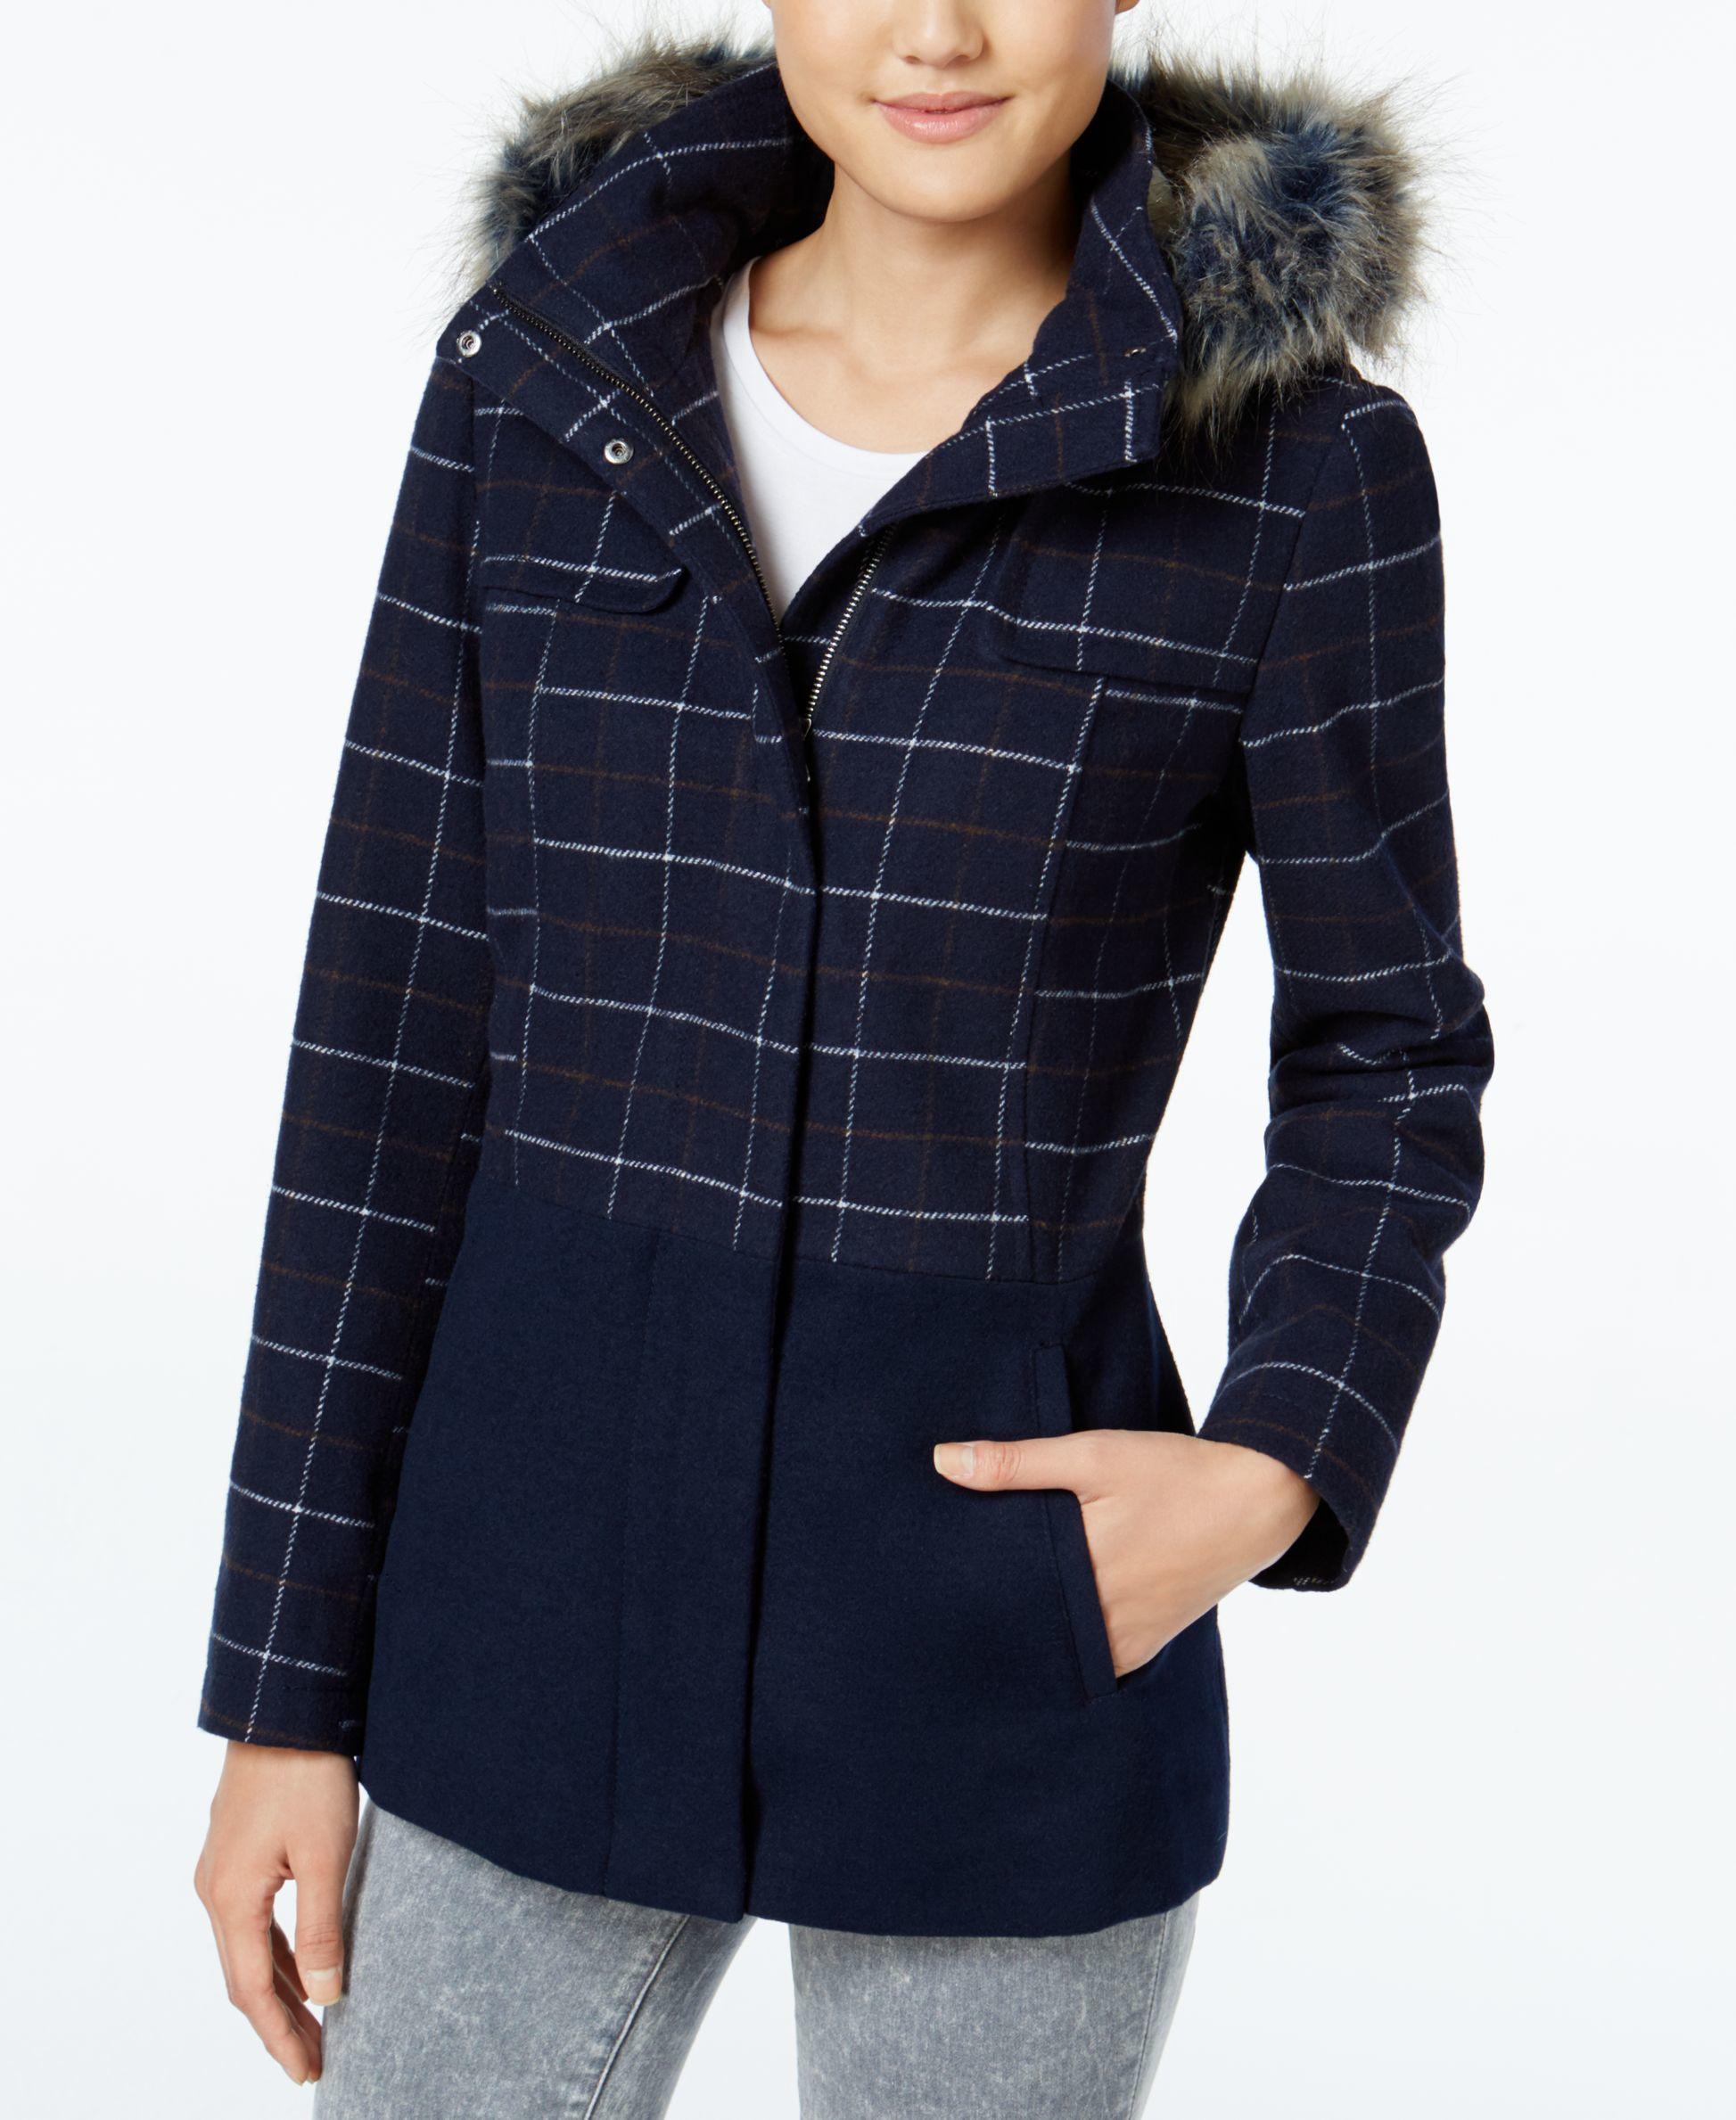 88 Best fur groups and crowds images   Fur fashion, Furs, Fur